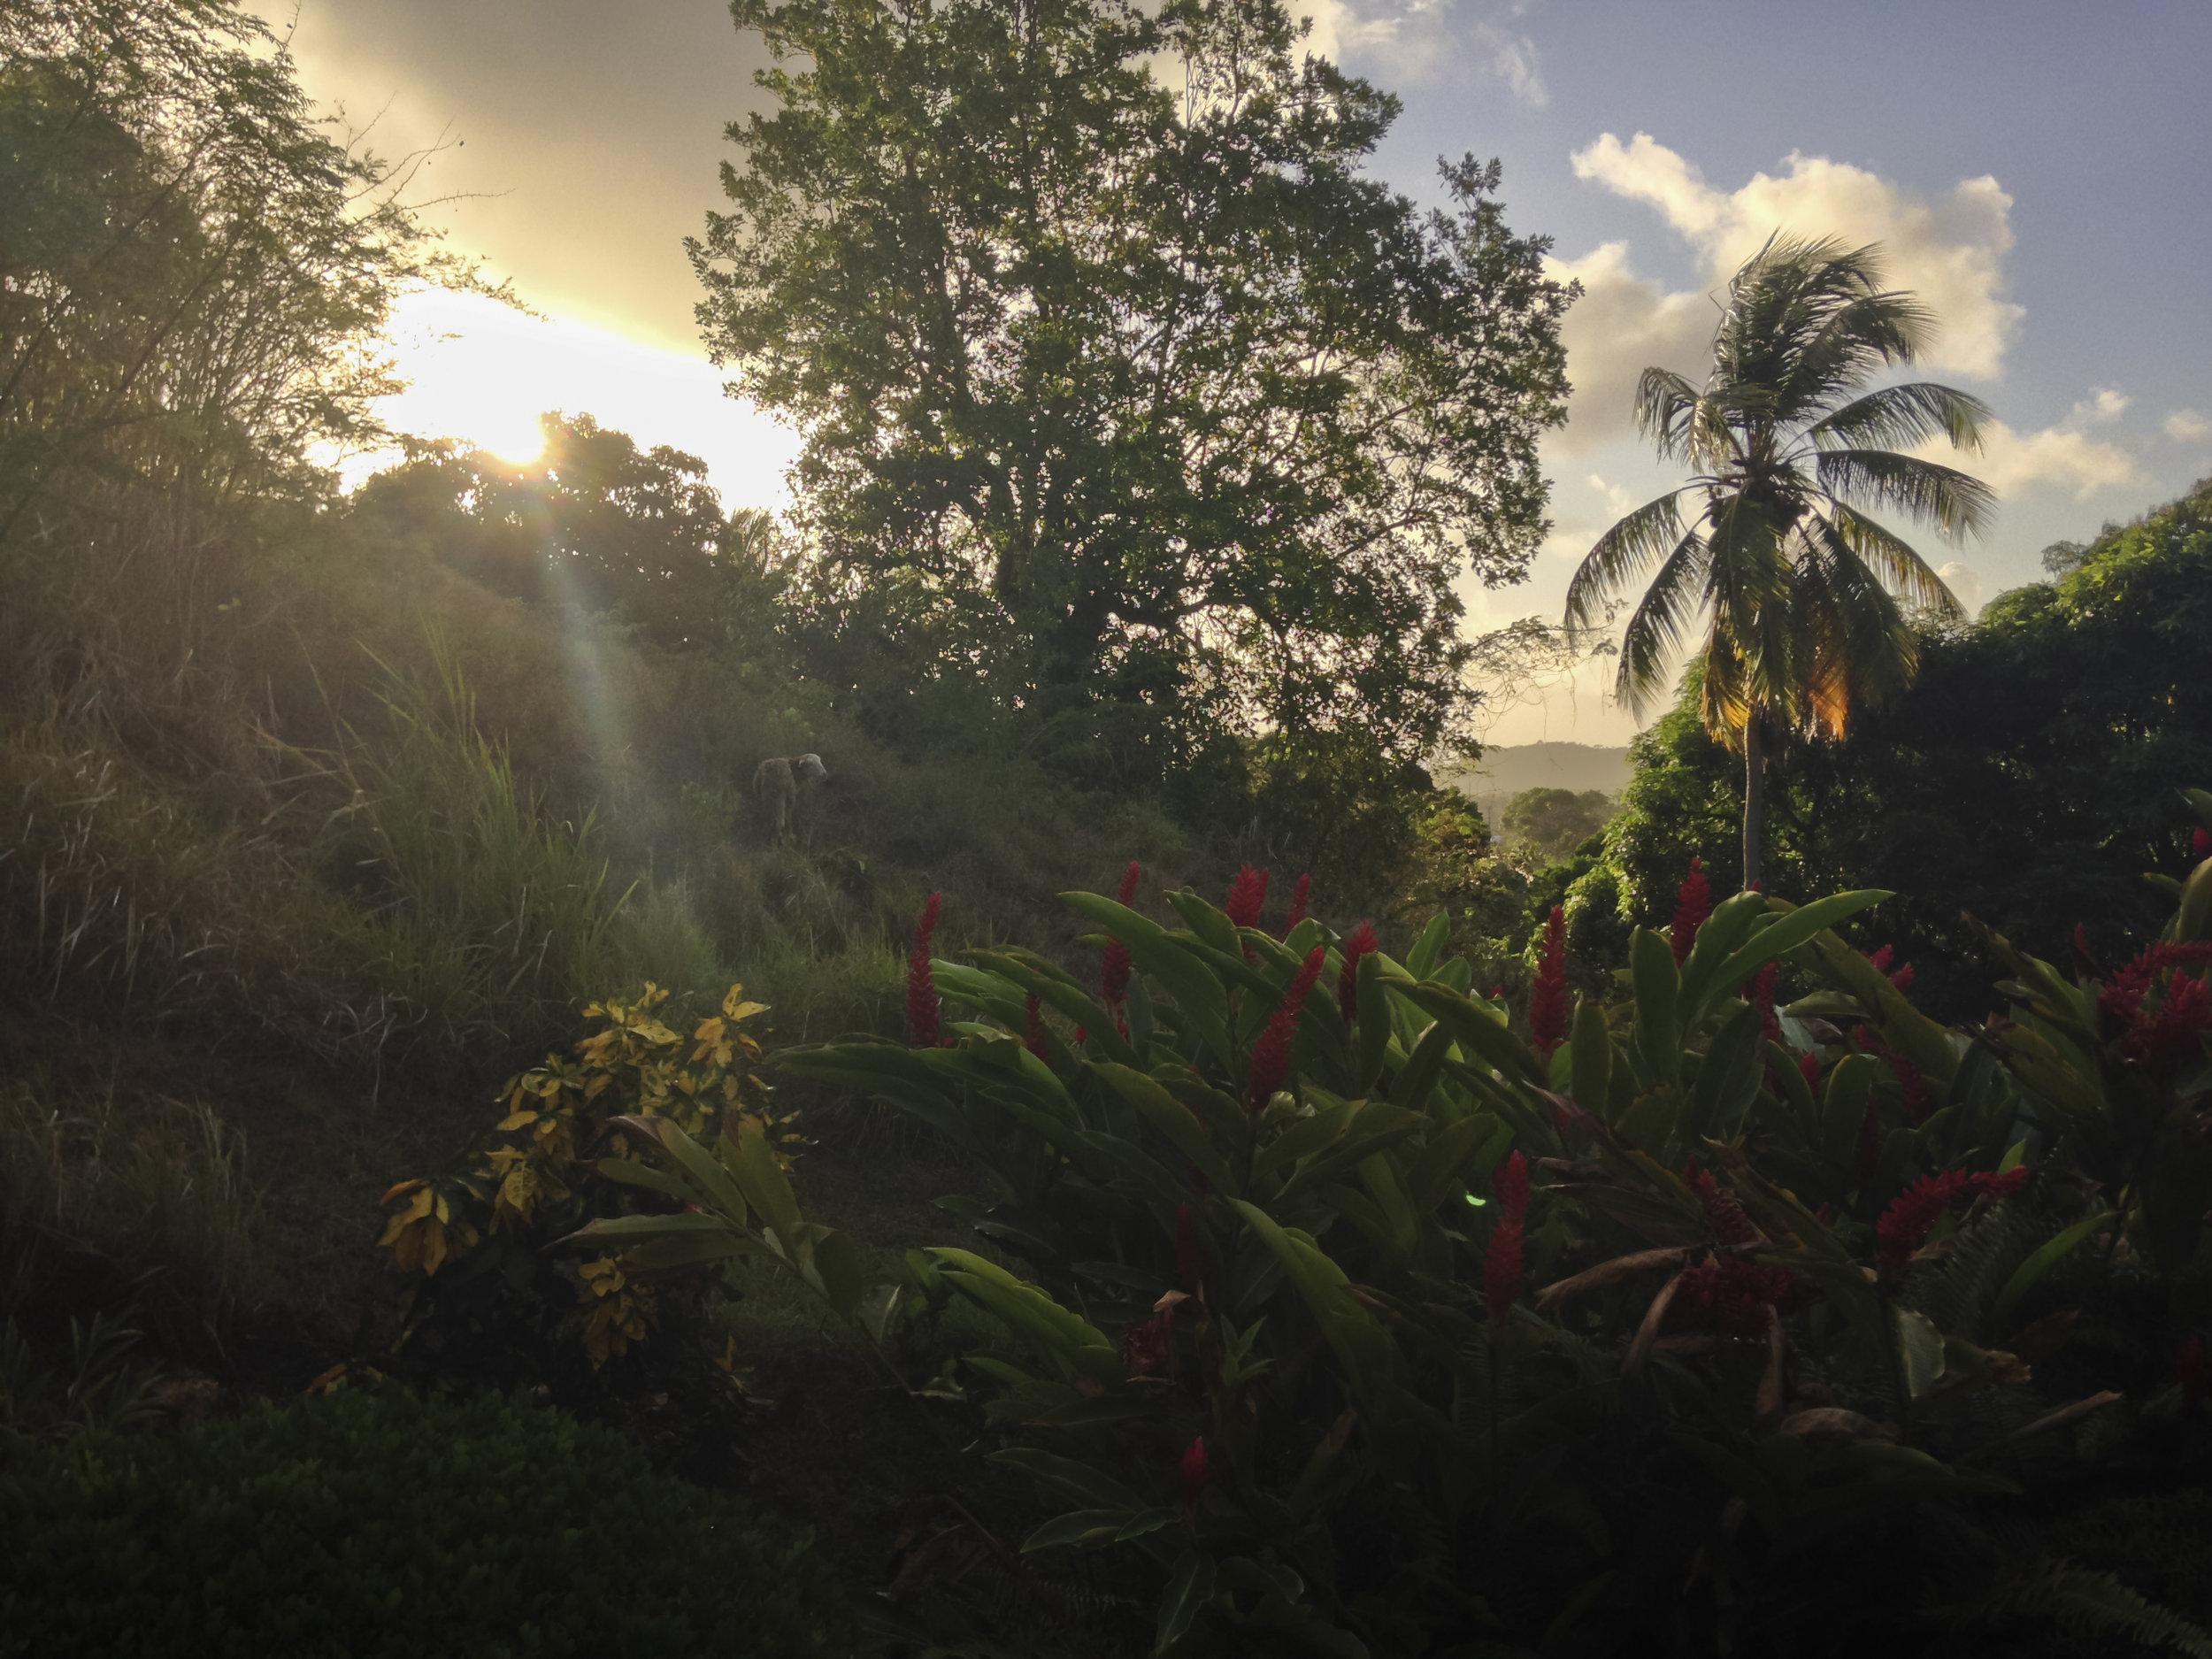 Le Vauclin, Martinique, France, Mars 2019